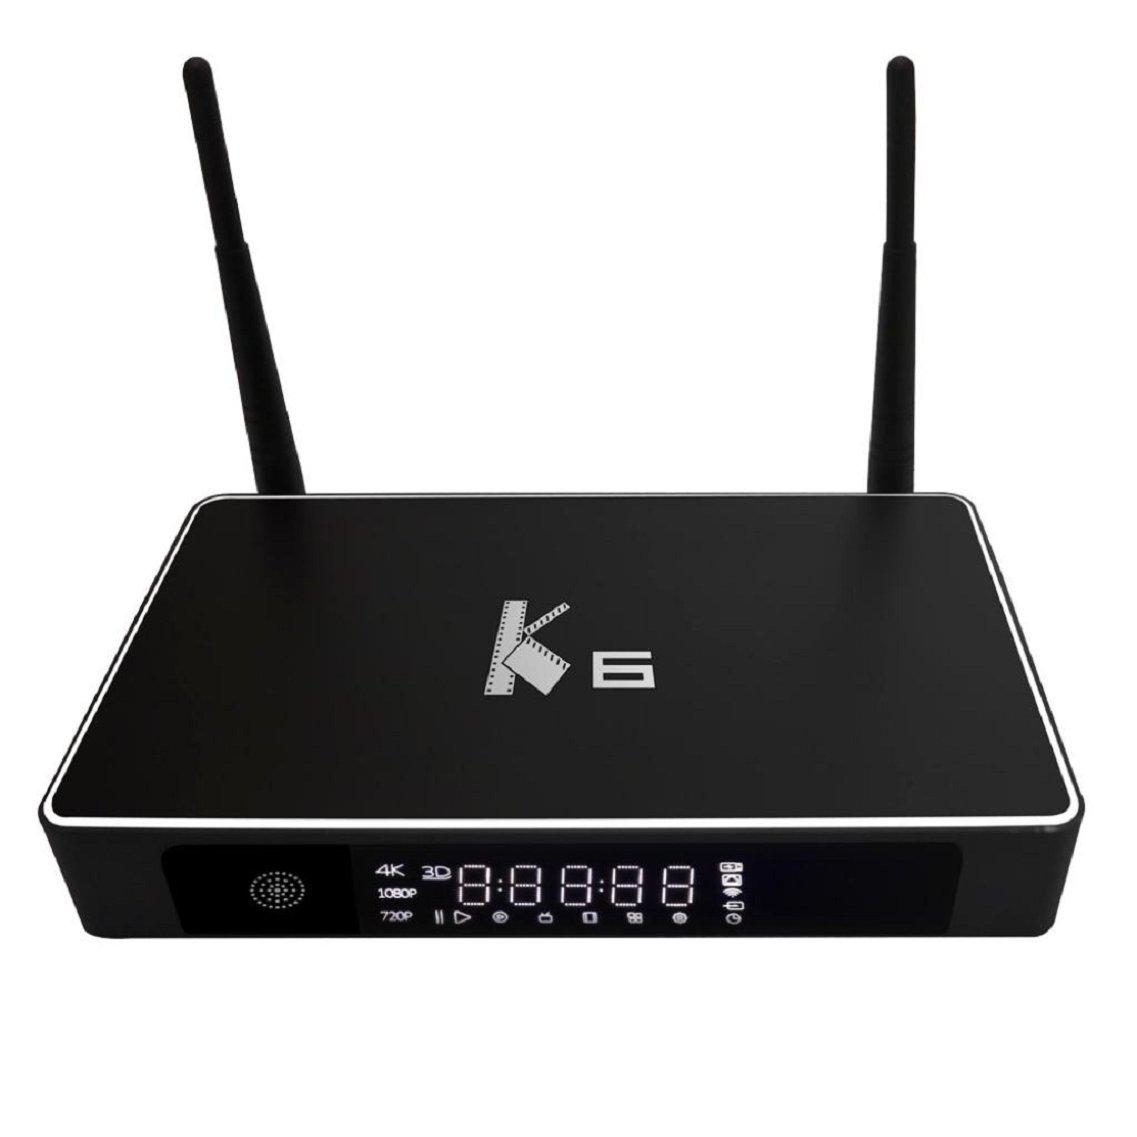 Lookatool K6 S812 Quad-core Android 5.1 4K FULL HD Smart TV Box 2G/16G KODI WIFI K6 S812 Quad-core Android 5.1 4K FULL HD Smart TV Box 2G/16G KODI WIFI